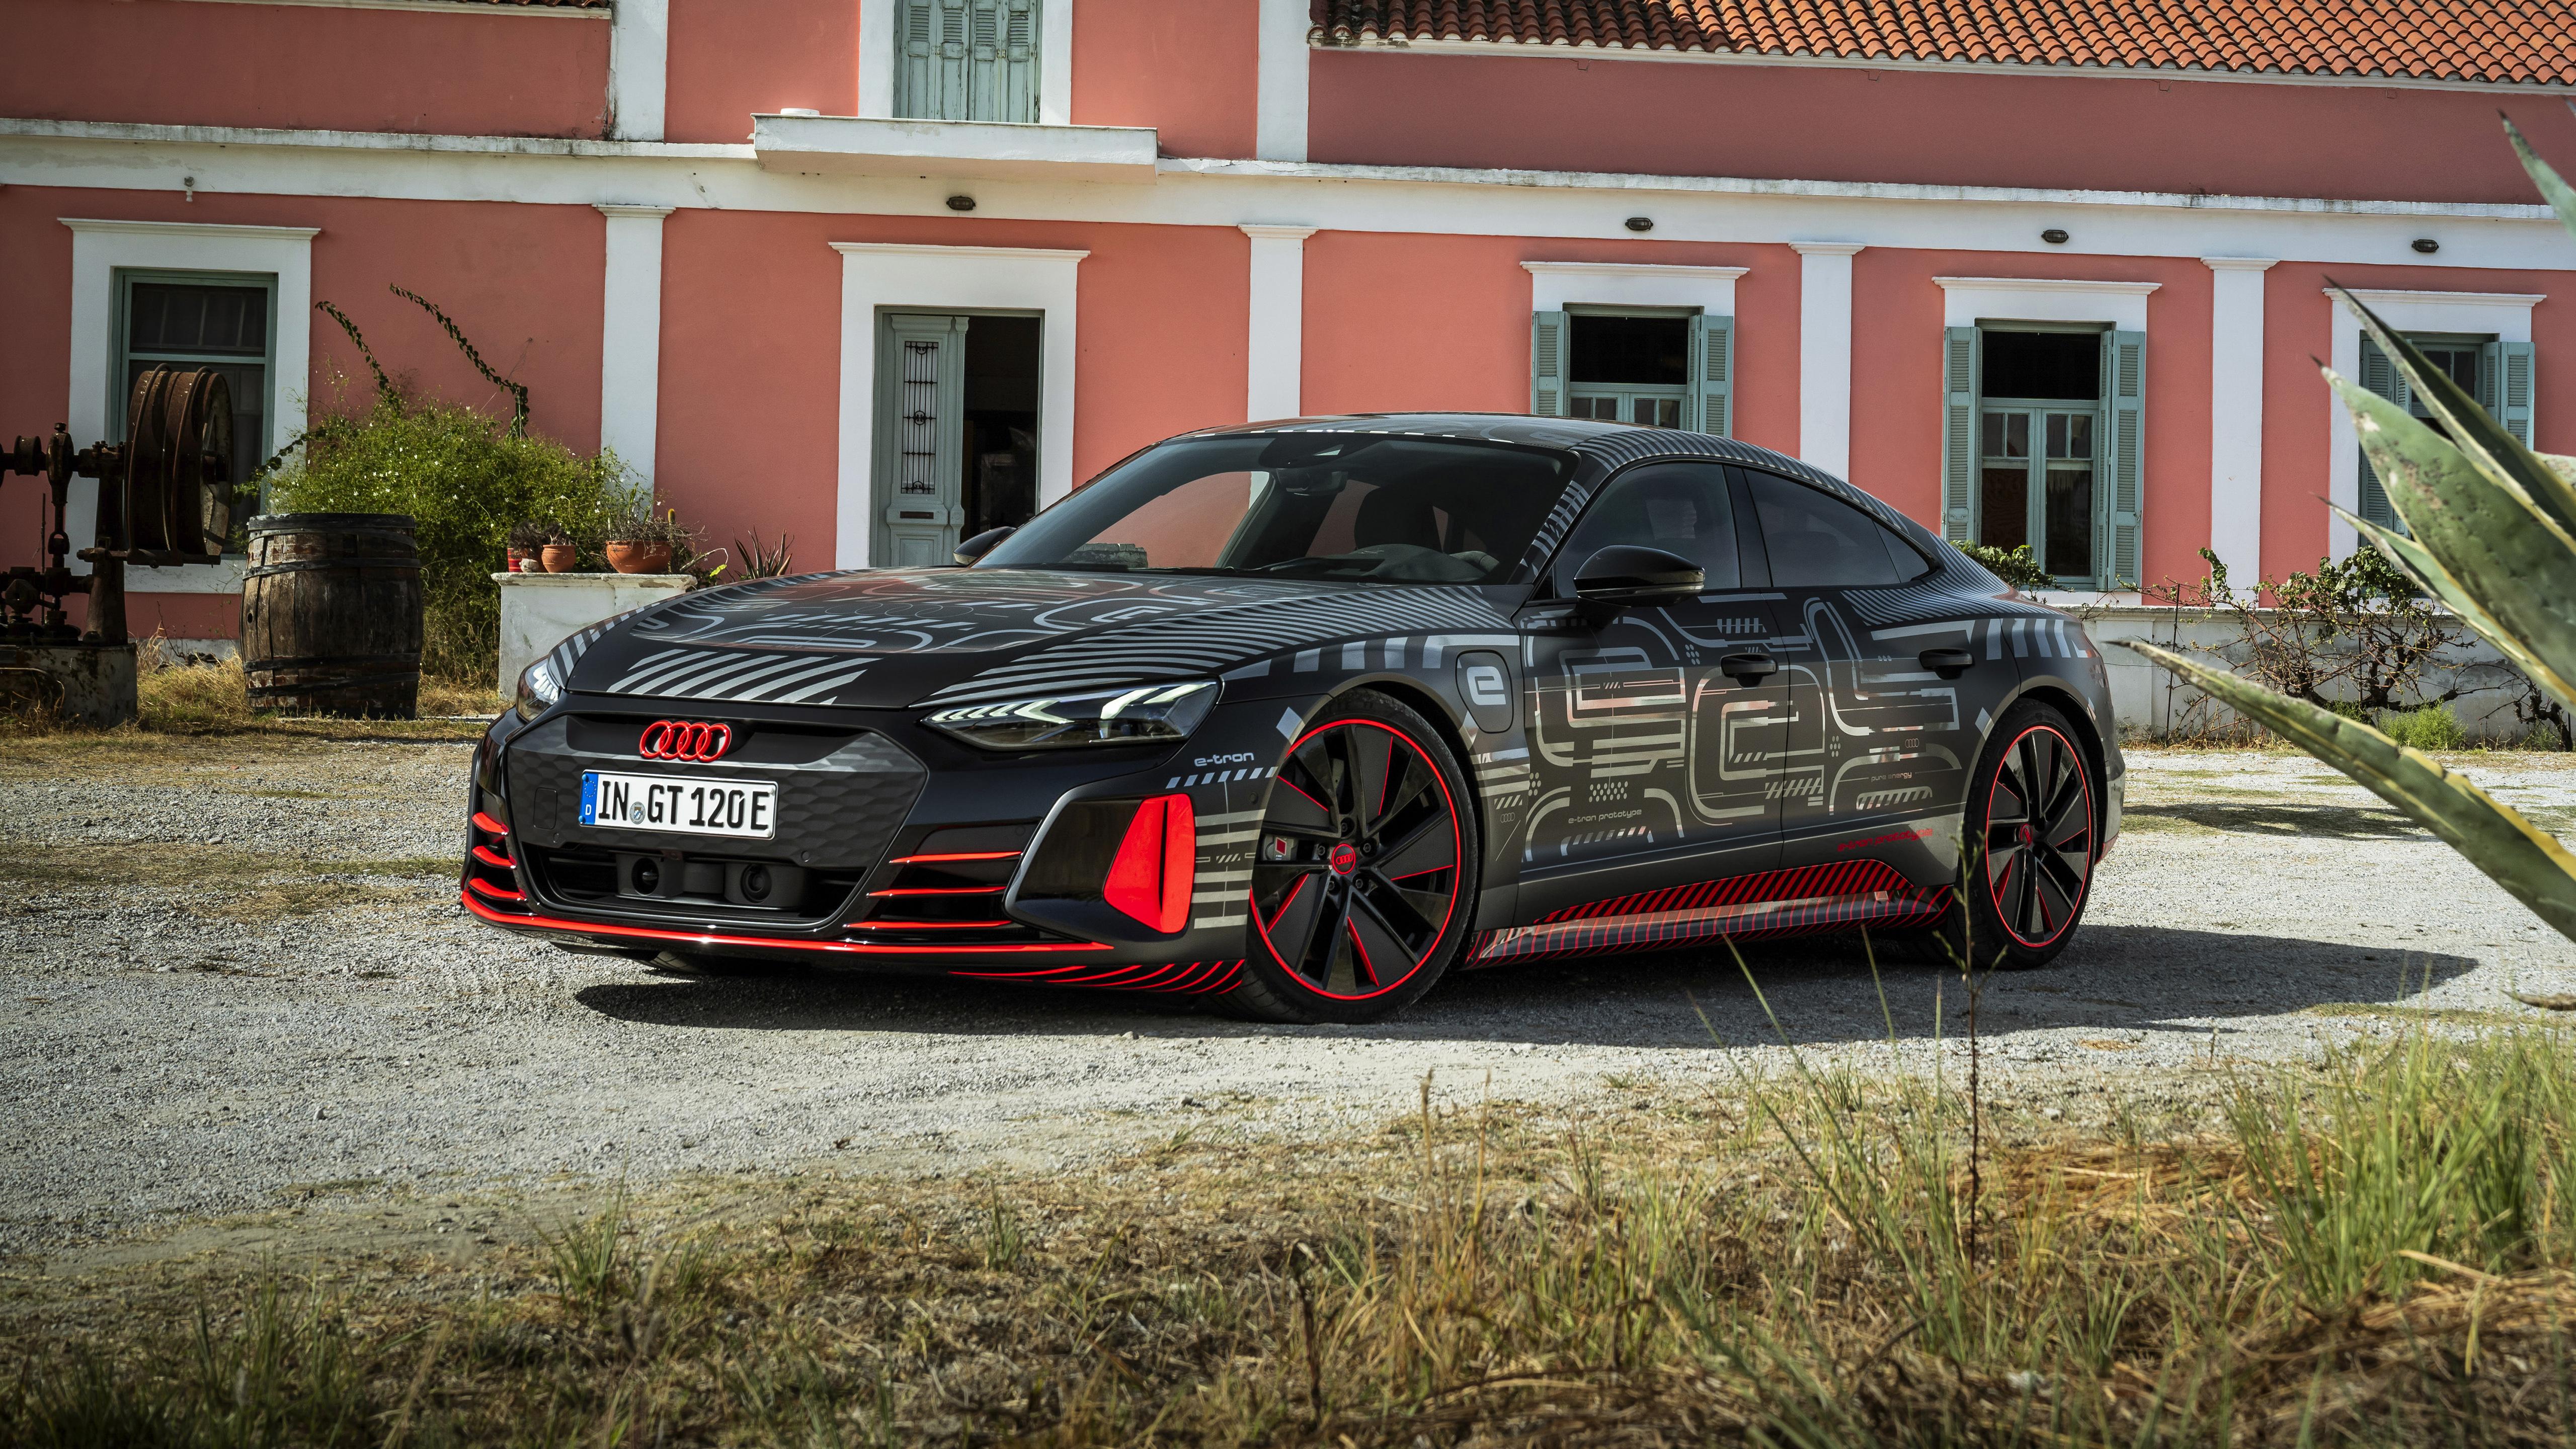 audi rs e-tron gt prototype 2021 5k 5 wallpaper | hd car